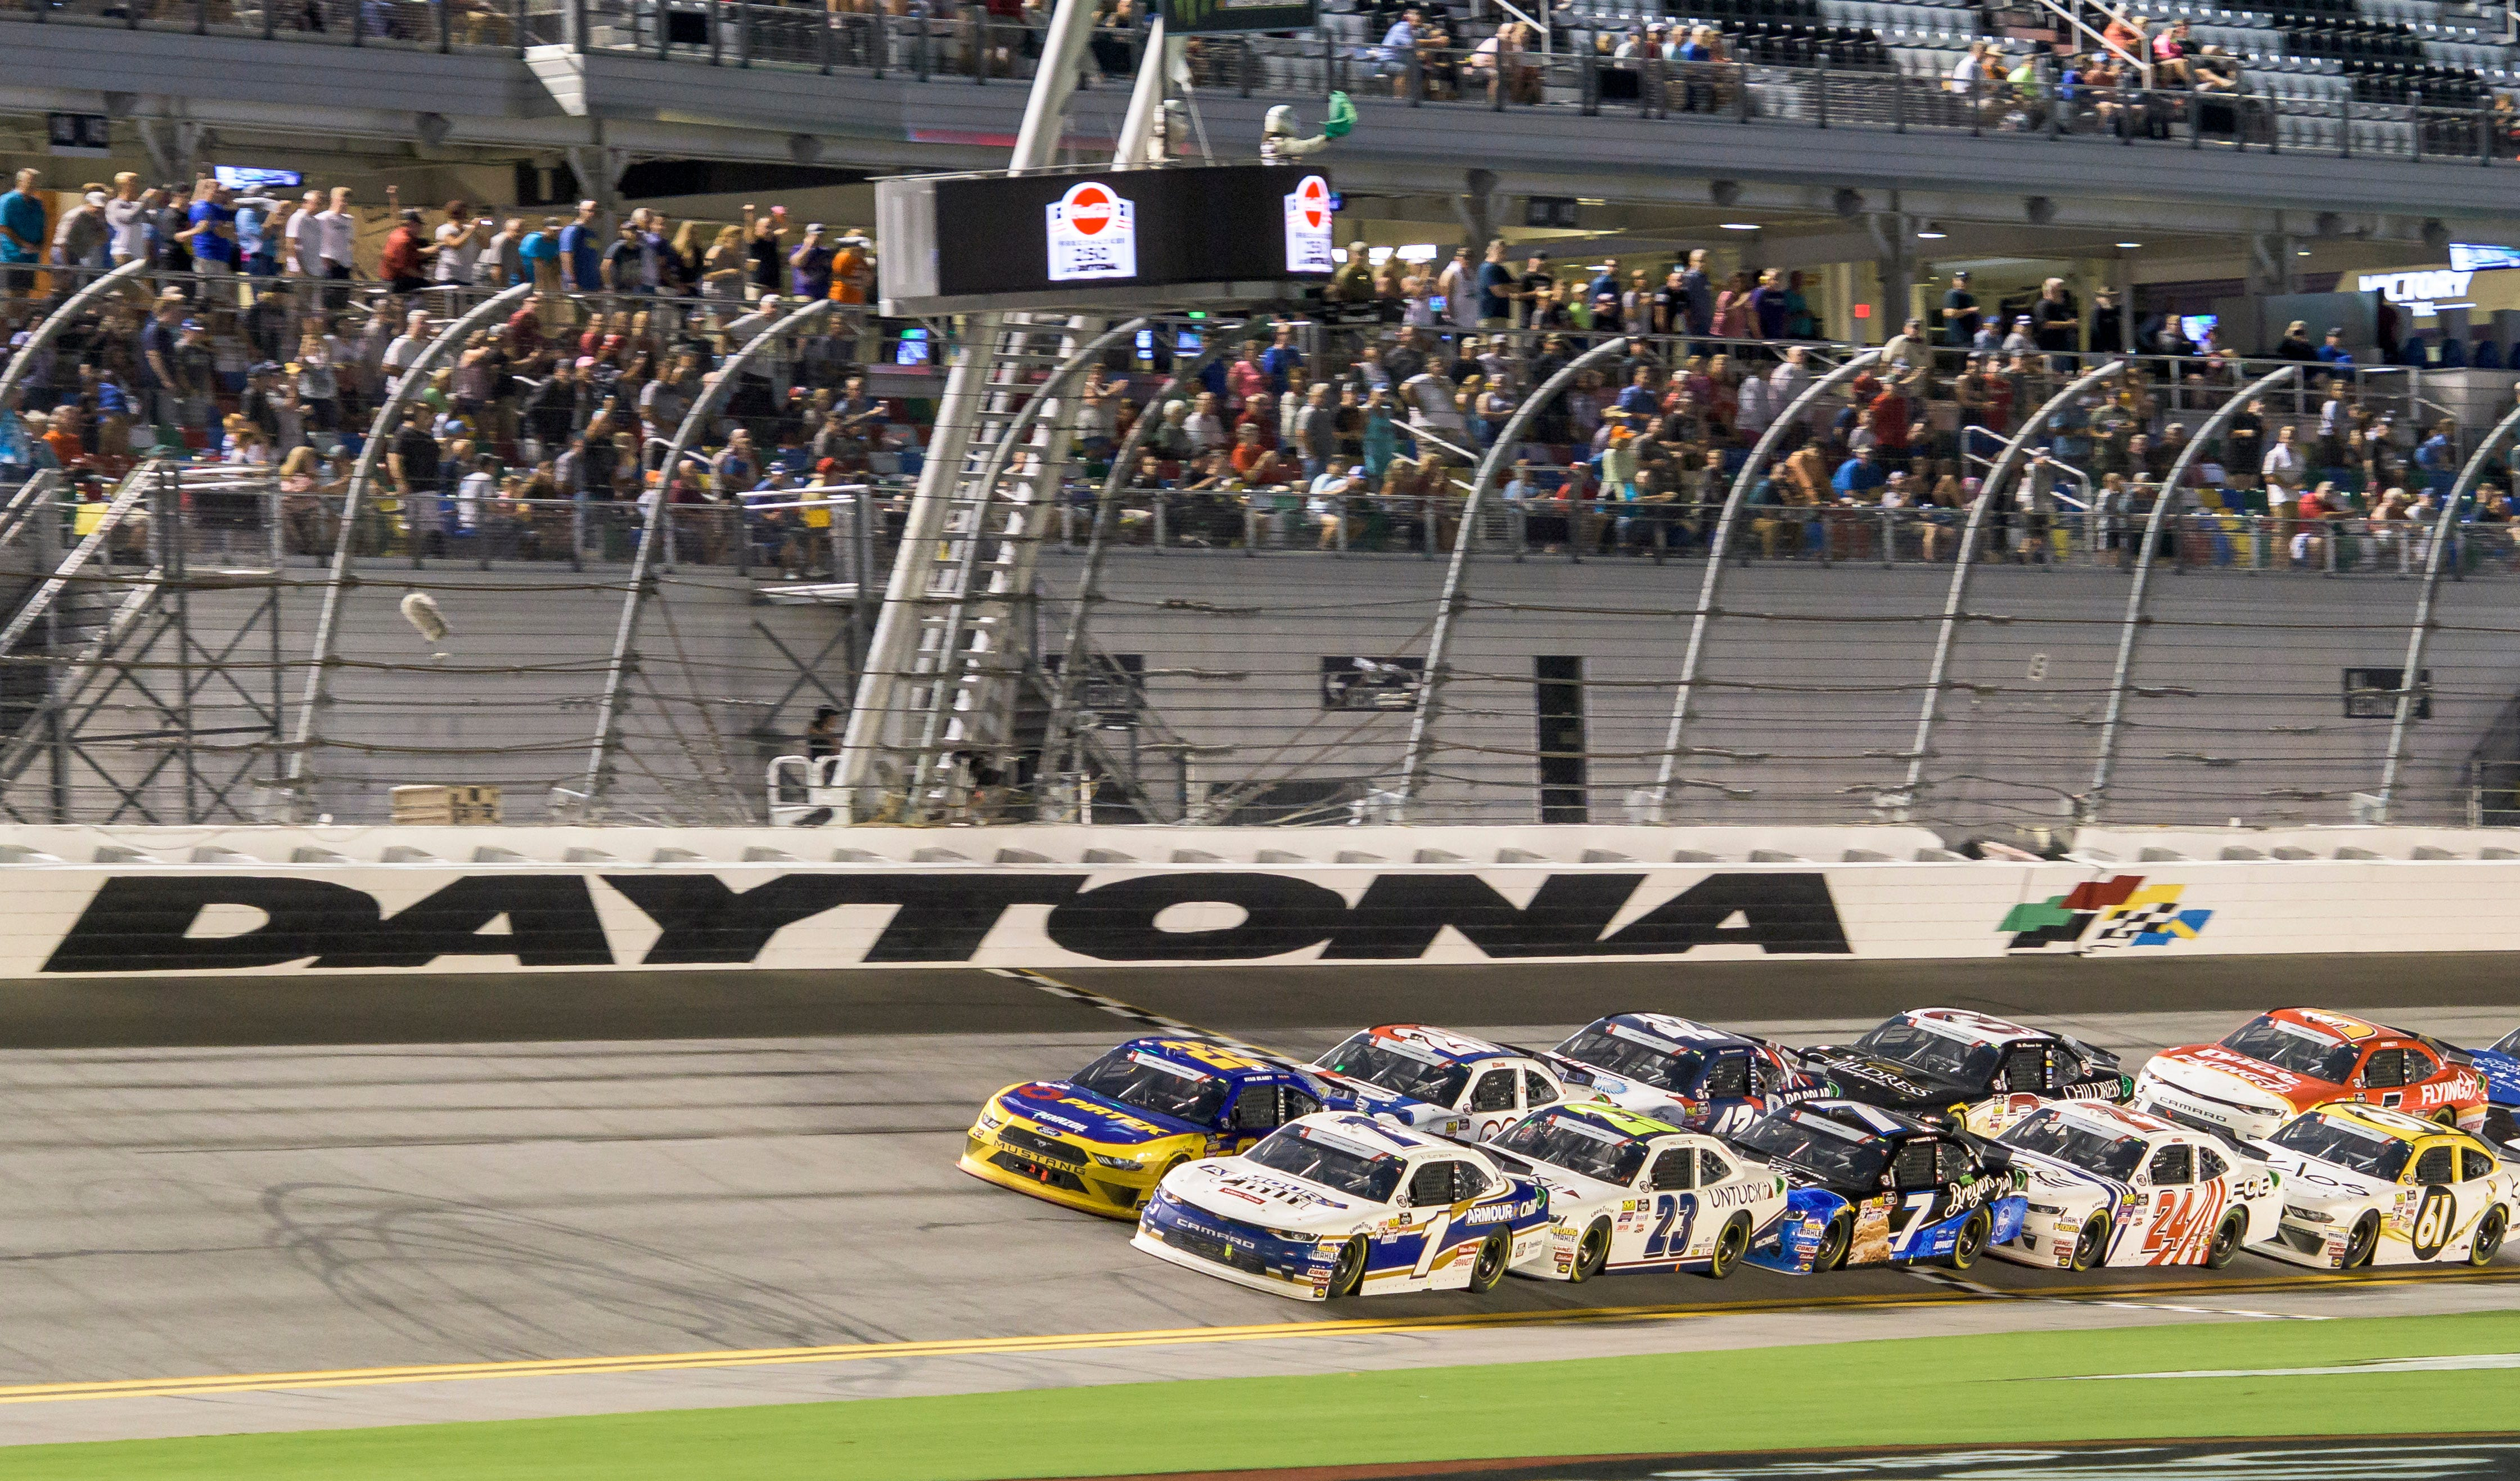 Seniors, start your engines: Florida schools to hold drive-thru graduation at Daytona 500